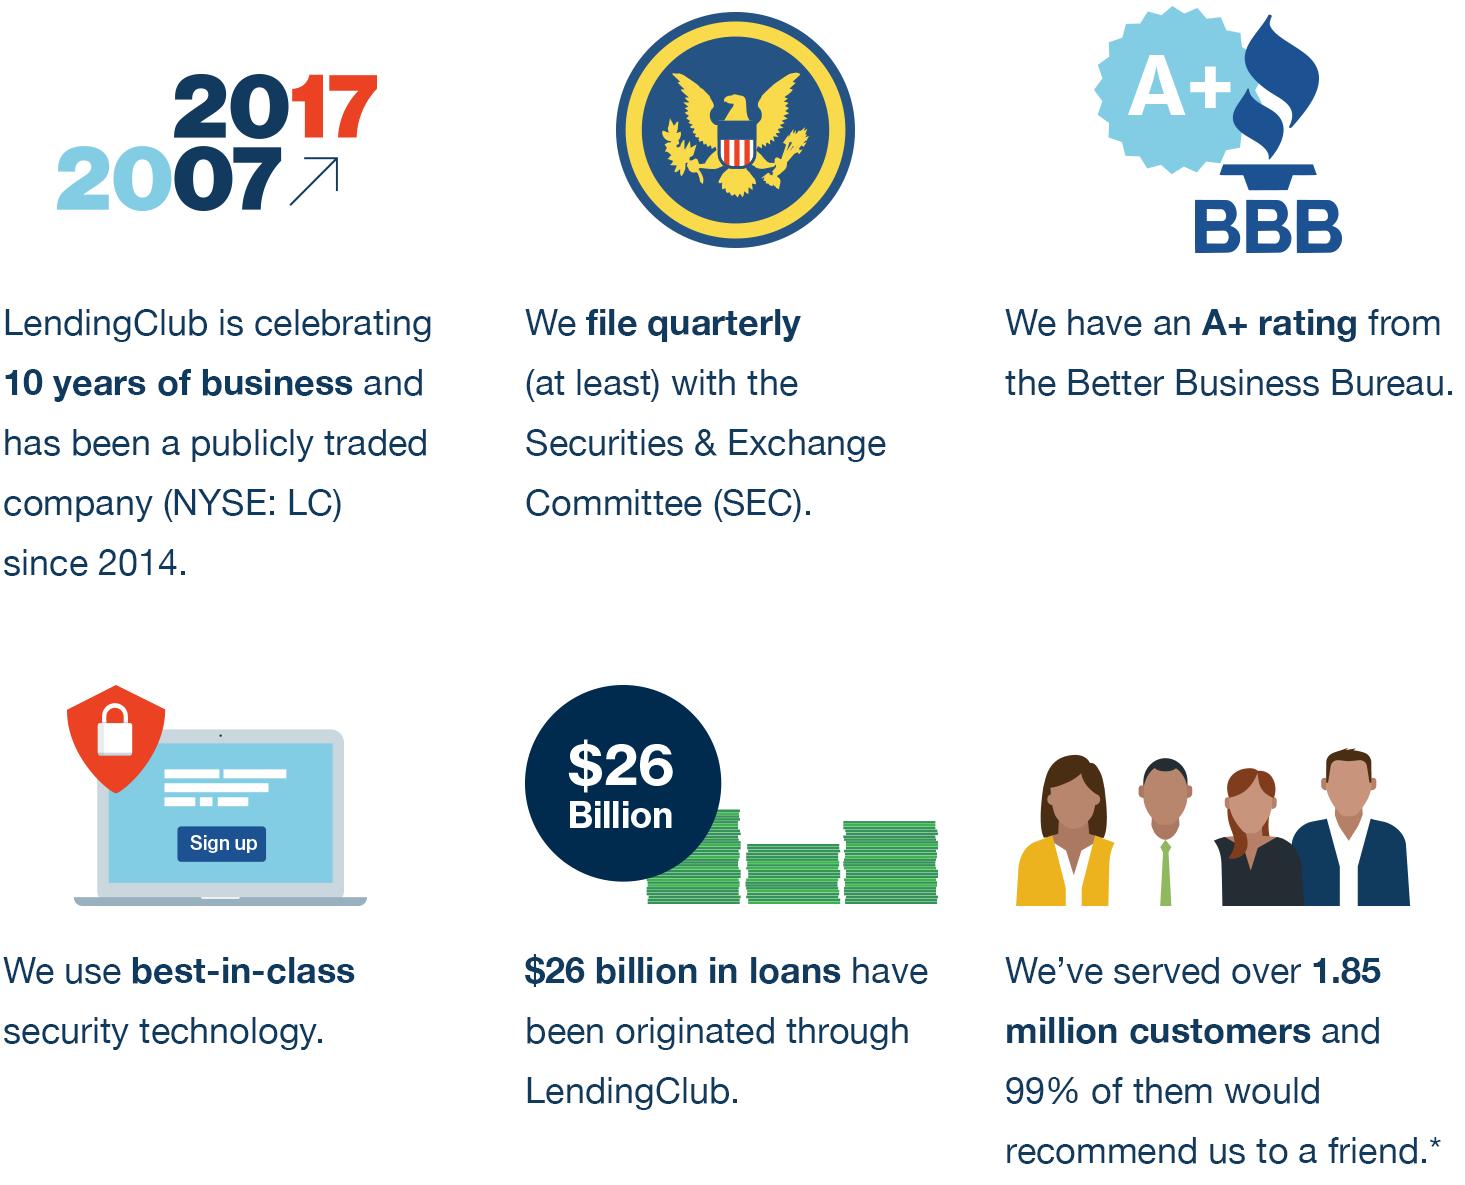 LendingClub accomplishments